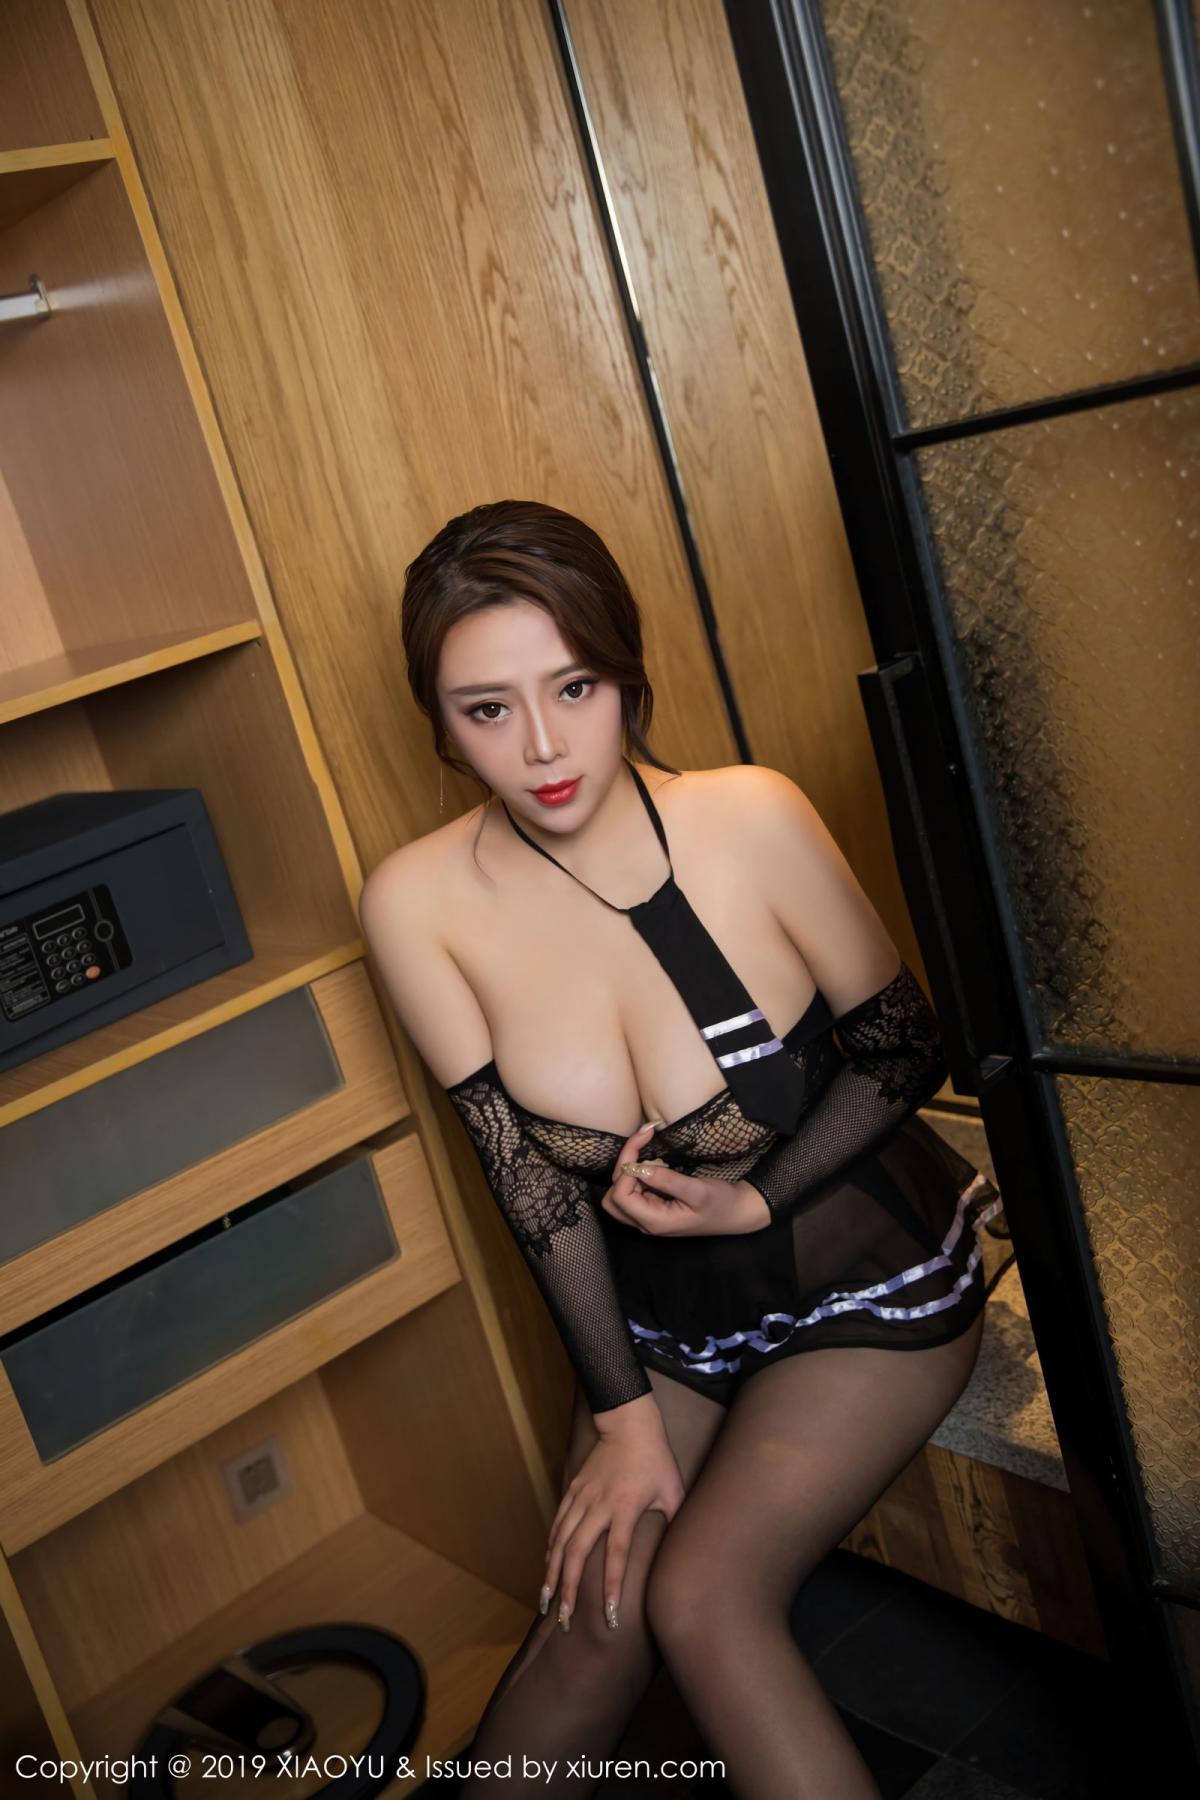 [XiaoYu] Vol.016 Miki Tu 19P, Miki Tu, Tall, XiaoYu